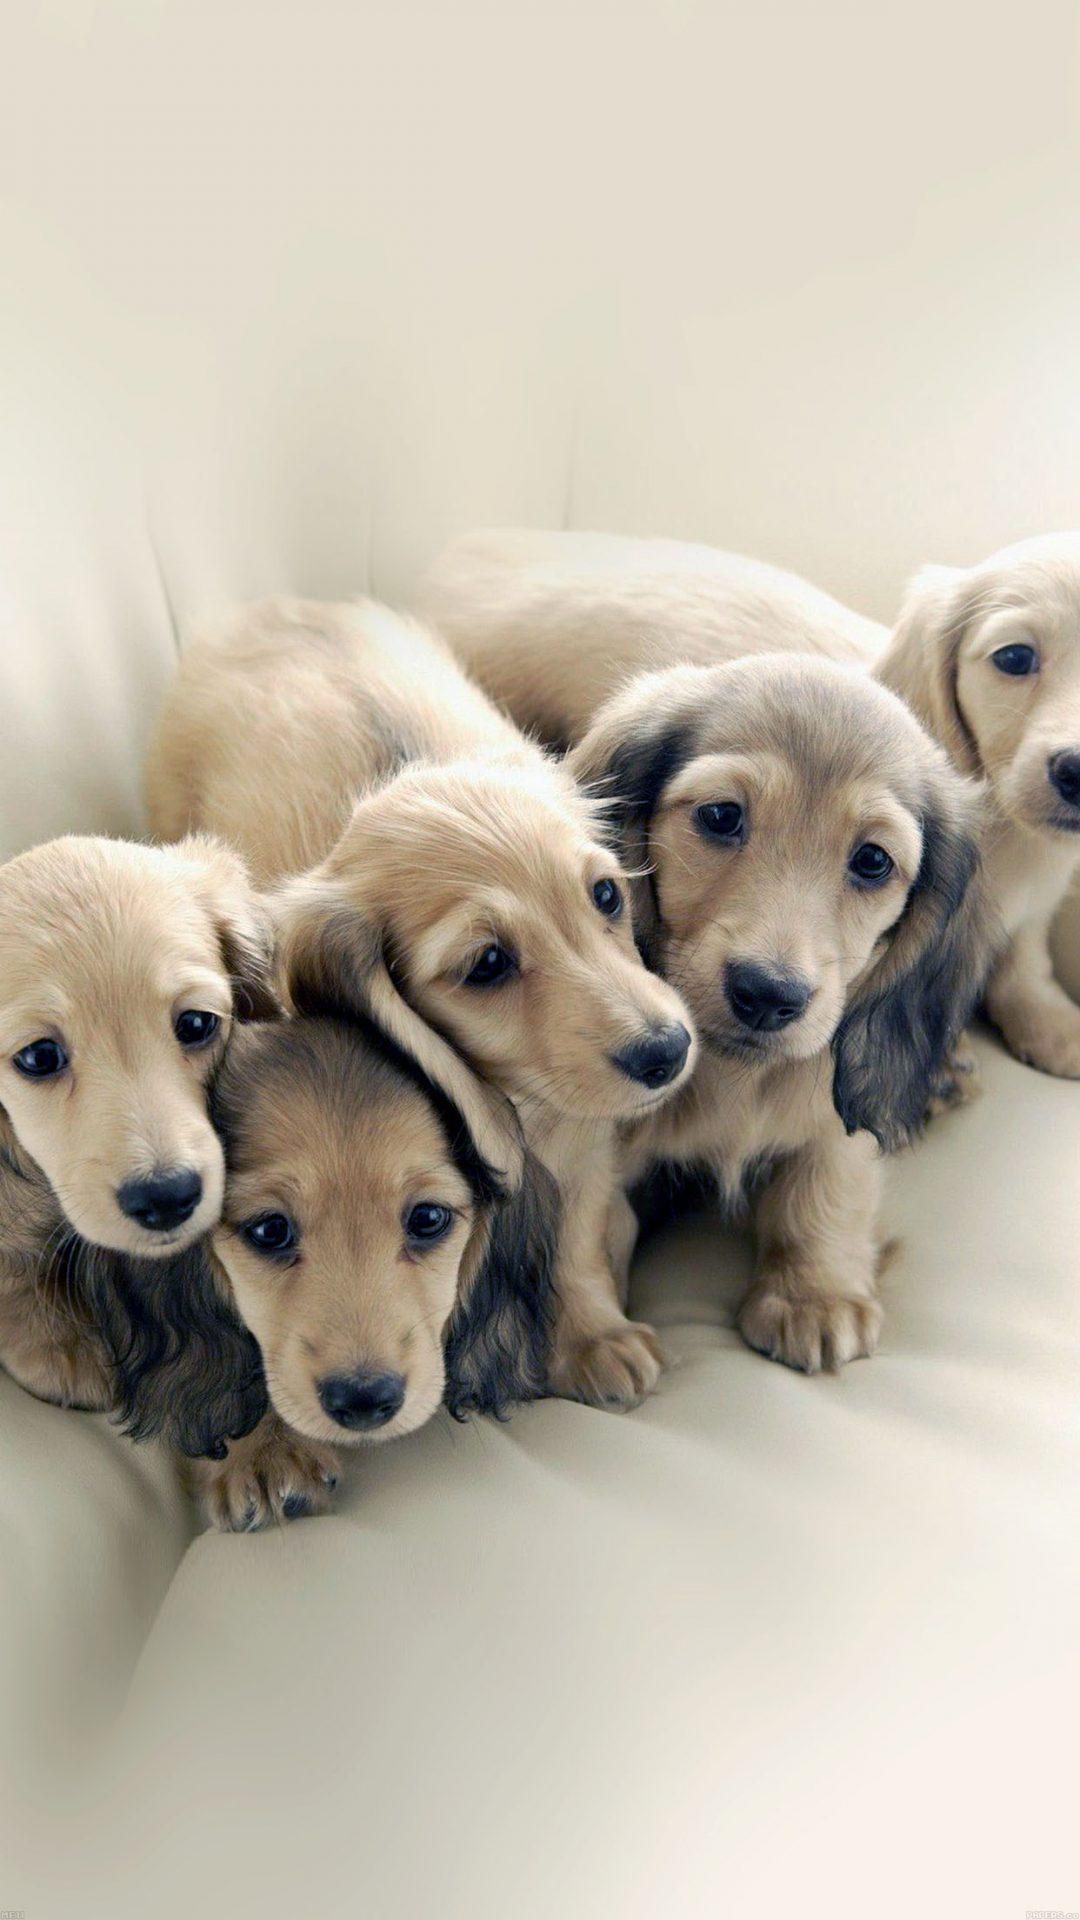 Puppy Dog Retriever Family Animal